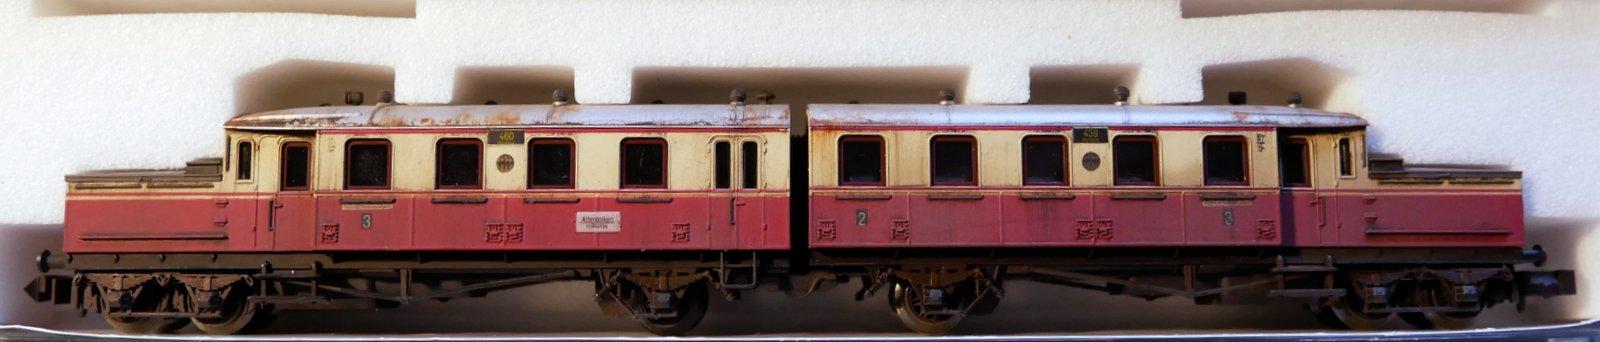 P1170743-001.JPG